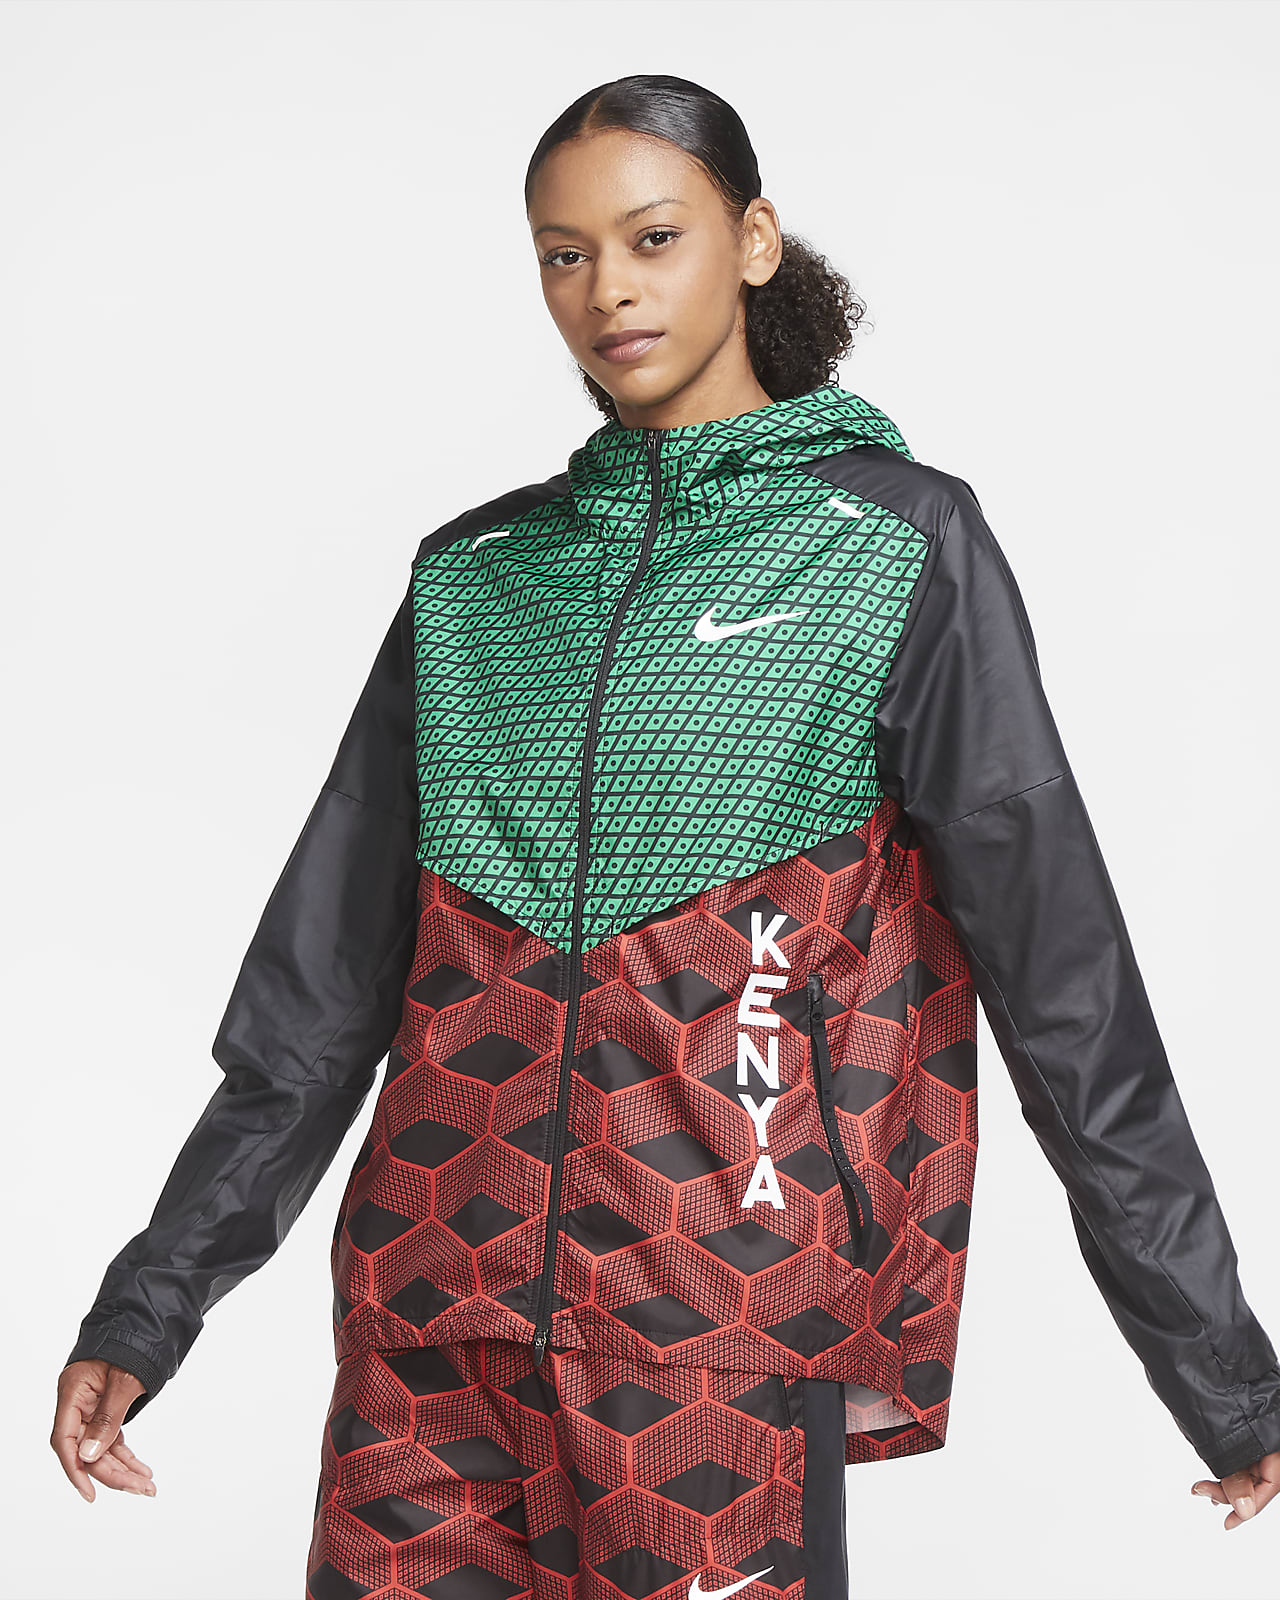 Nike Team Kenya Shieldrunner Running Jacket